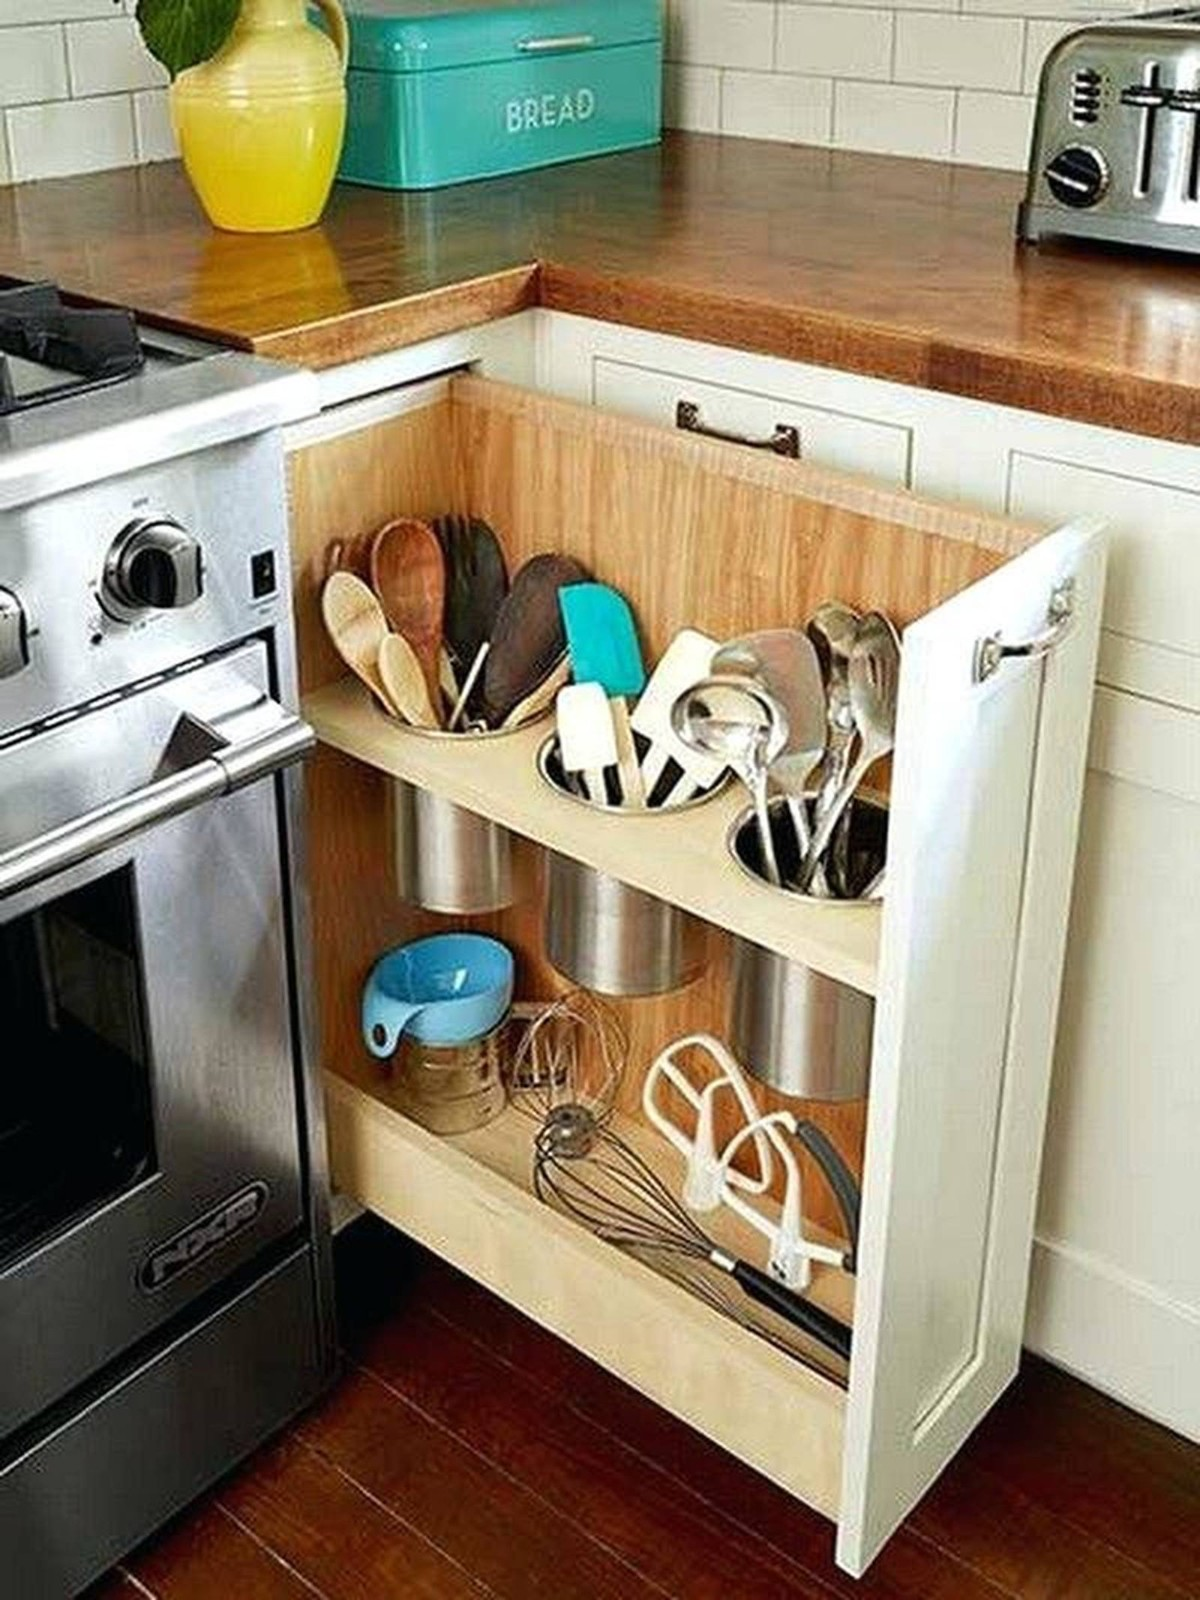 дизайн малогабаритной кухни организация систем хранения утвари